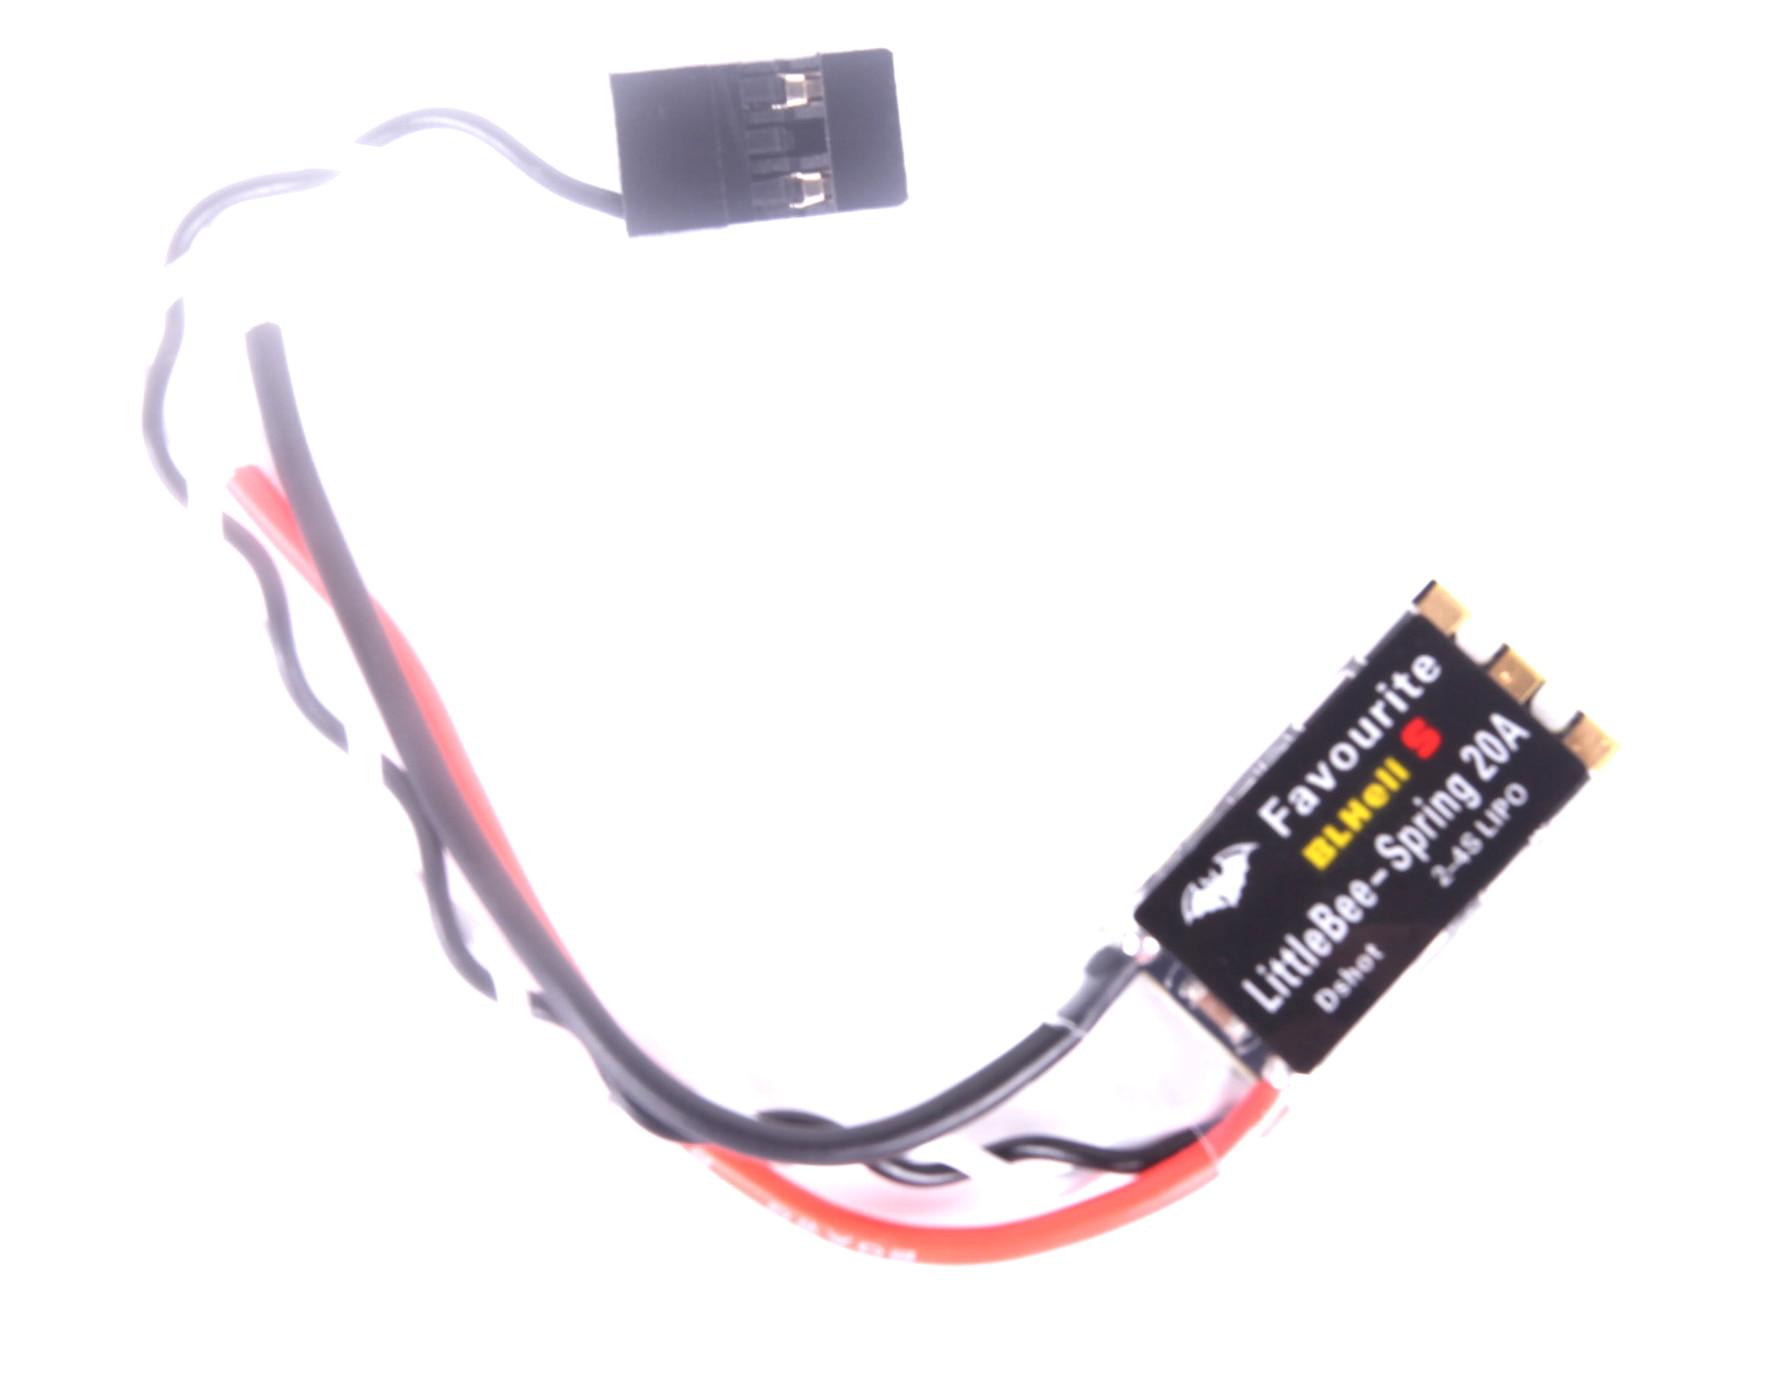 Original Favourite FVT LITTLEBEE BLlheli-s SPRING 20A 30A ESC 2-6S Supports Mulitshot DSHOT Oneshot42 OneShot125 Multicopter